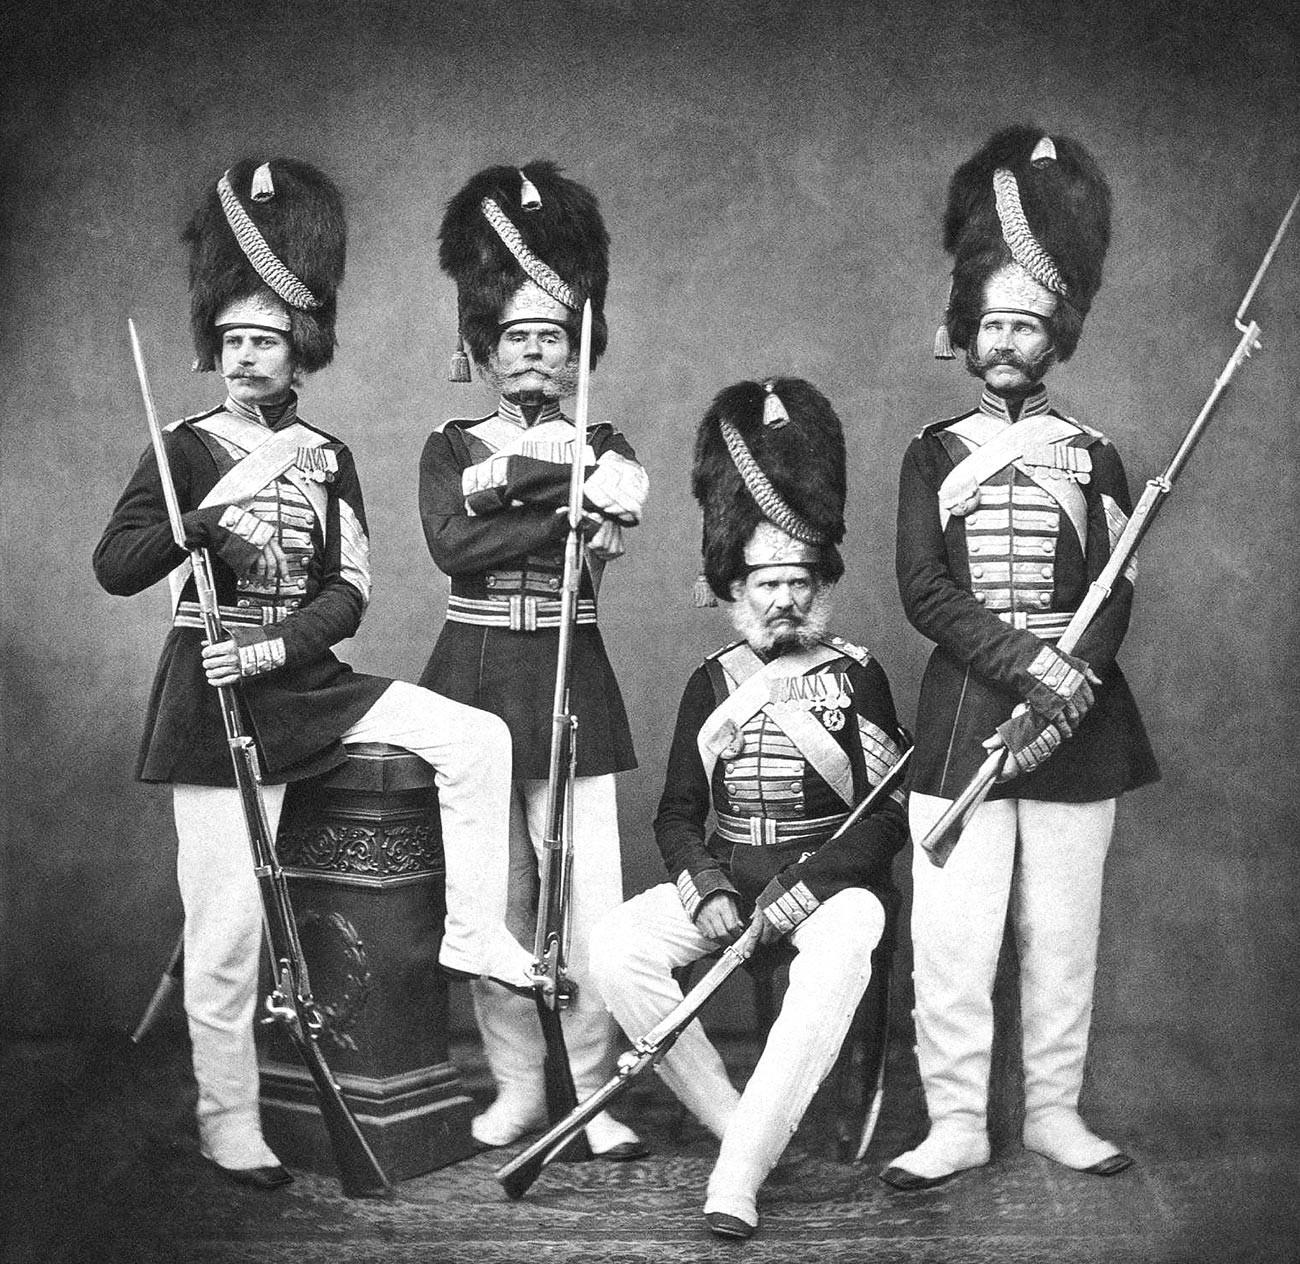 Портрет на група дворцови гренадири, 1870-80 г.